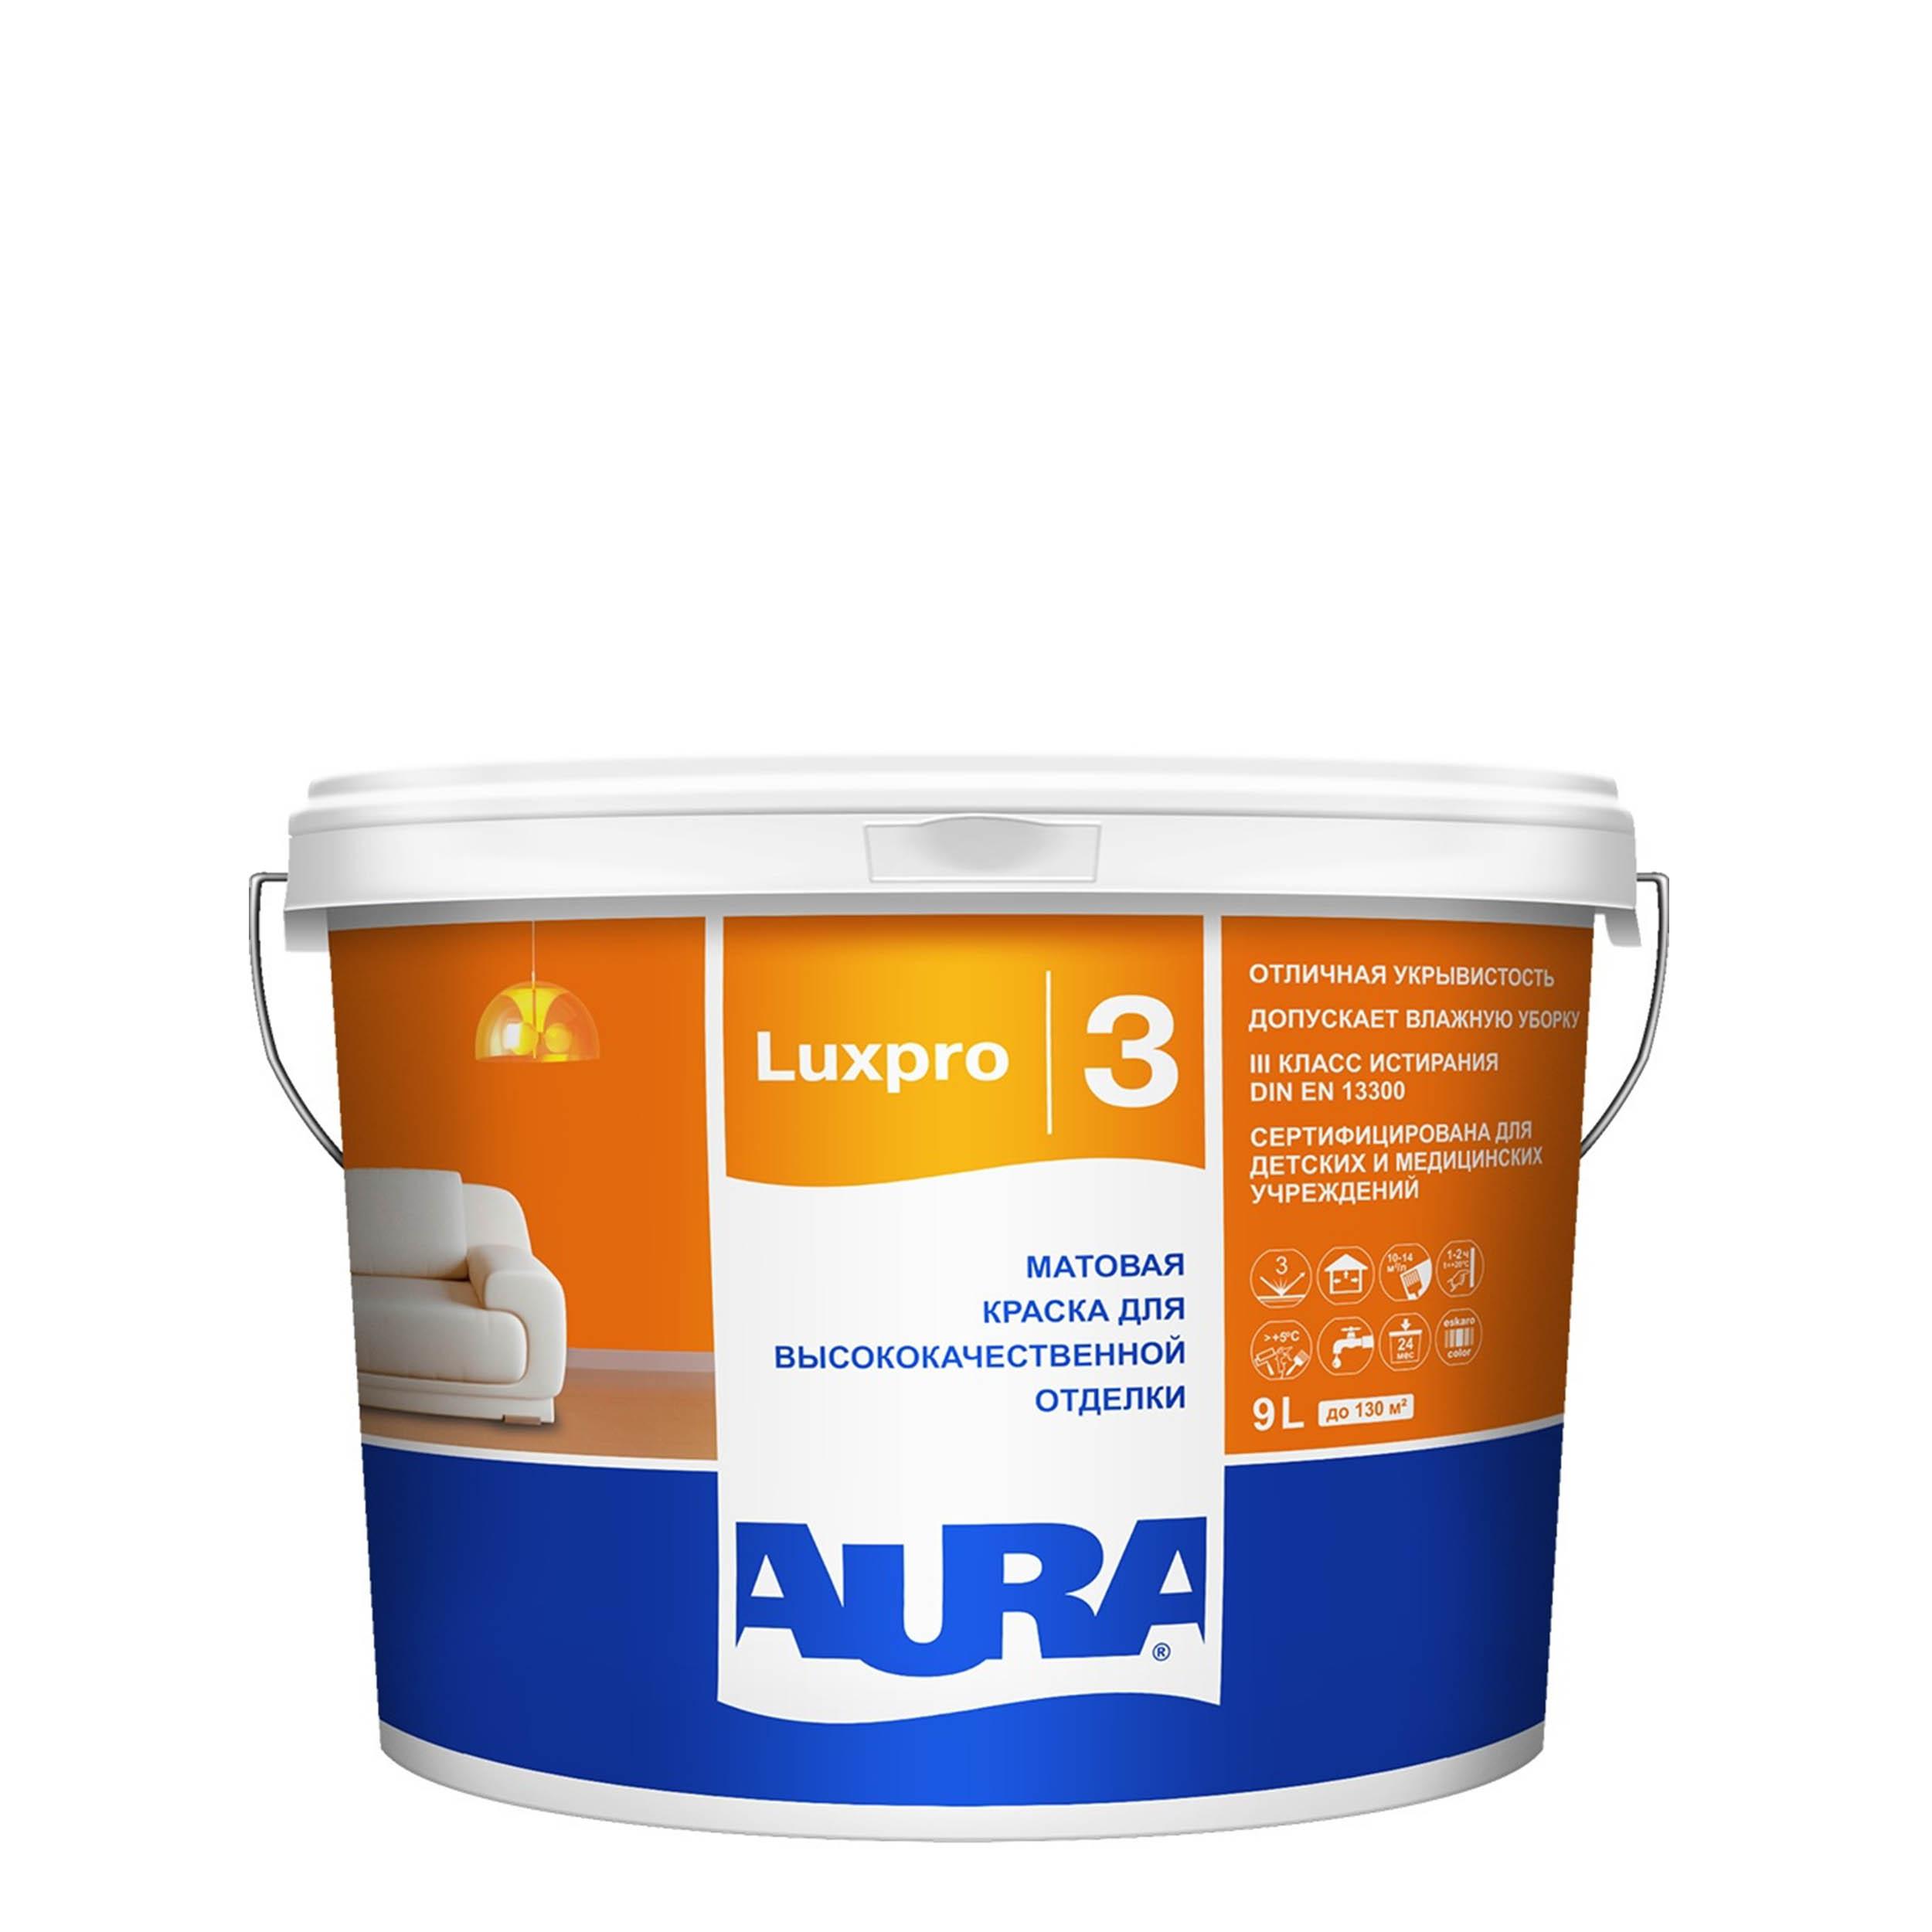 Фото 6 - Краска интерьерная, Aura LuxPRO 3, RAL 1005, 11 кг.